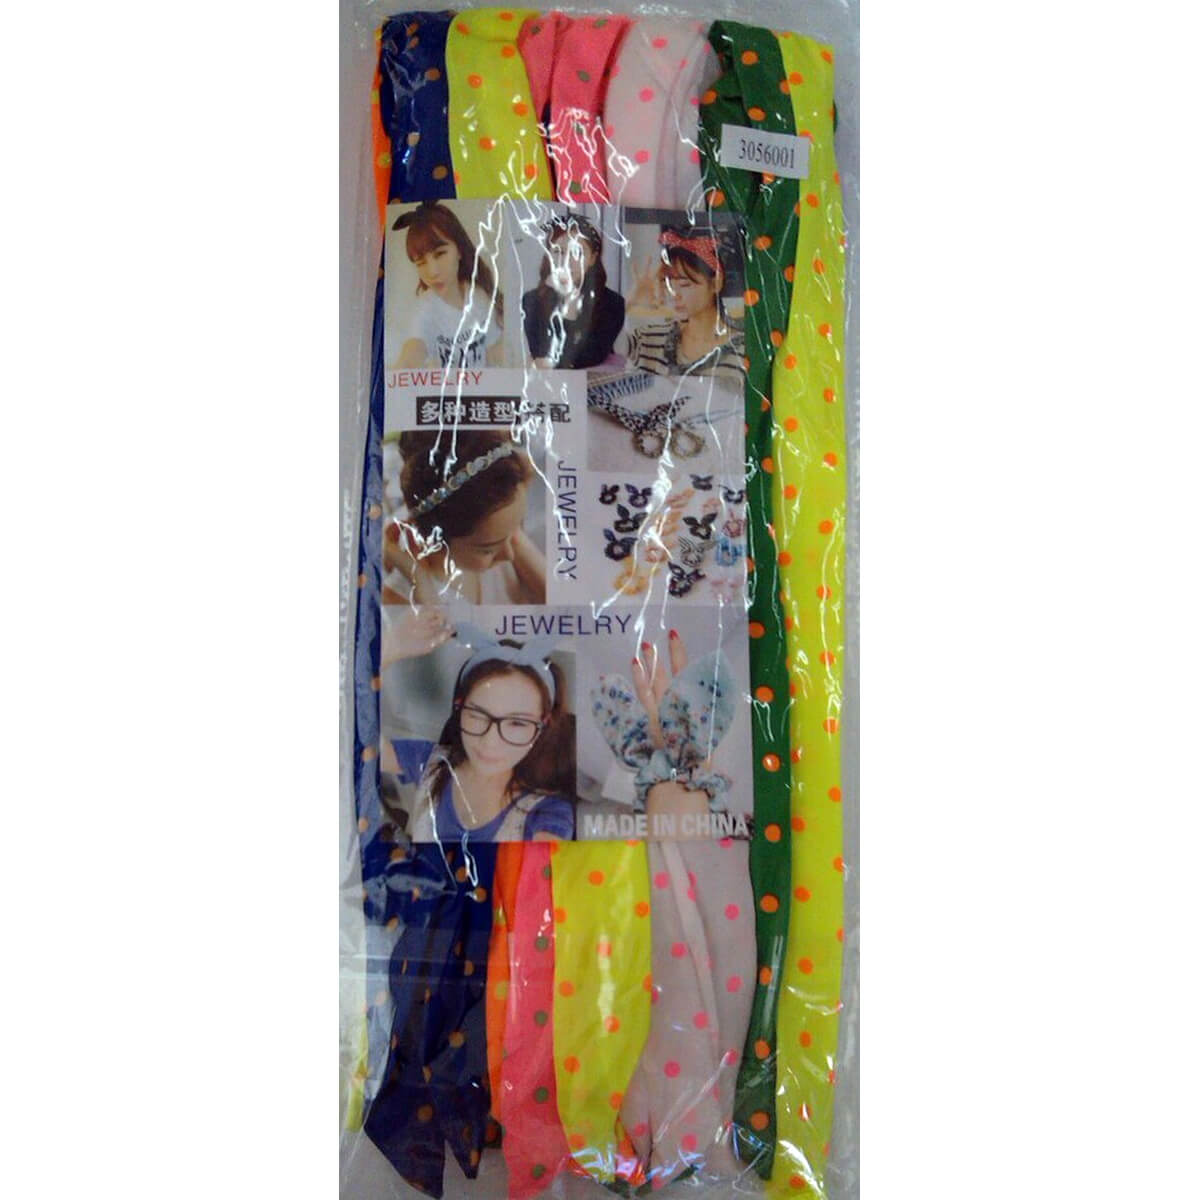 Набор повязок для волос «Солоха» 3056001